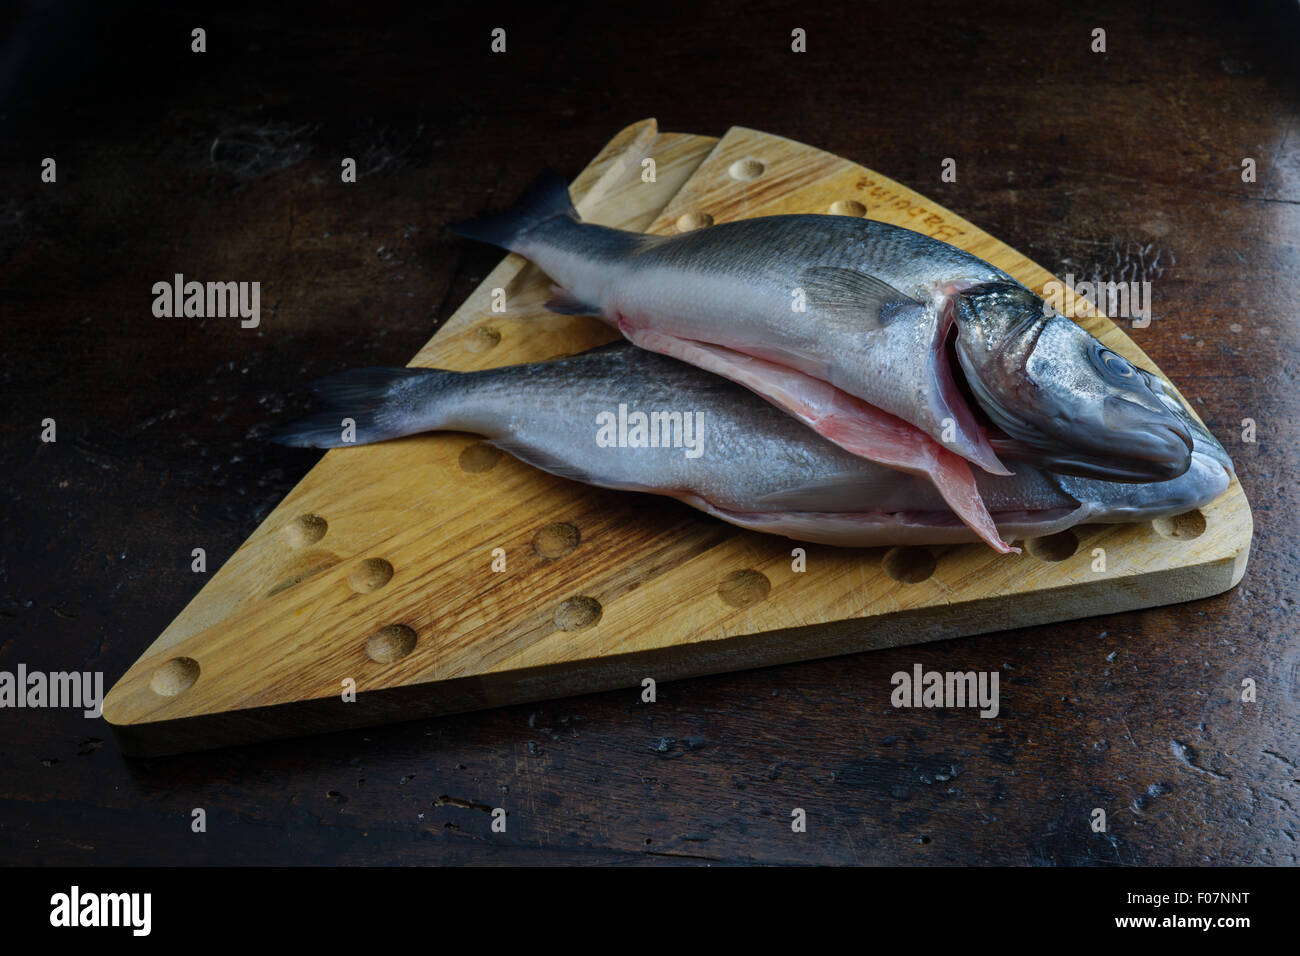 Uncoucked poisson sur une vieille table marron Photo Stock